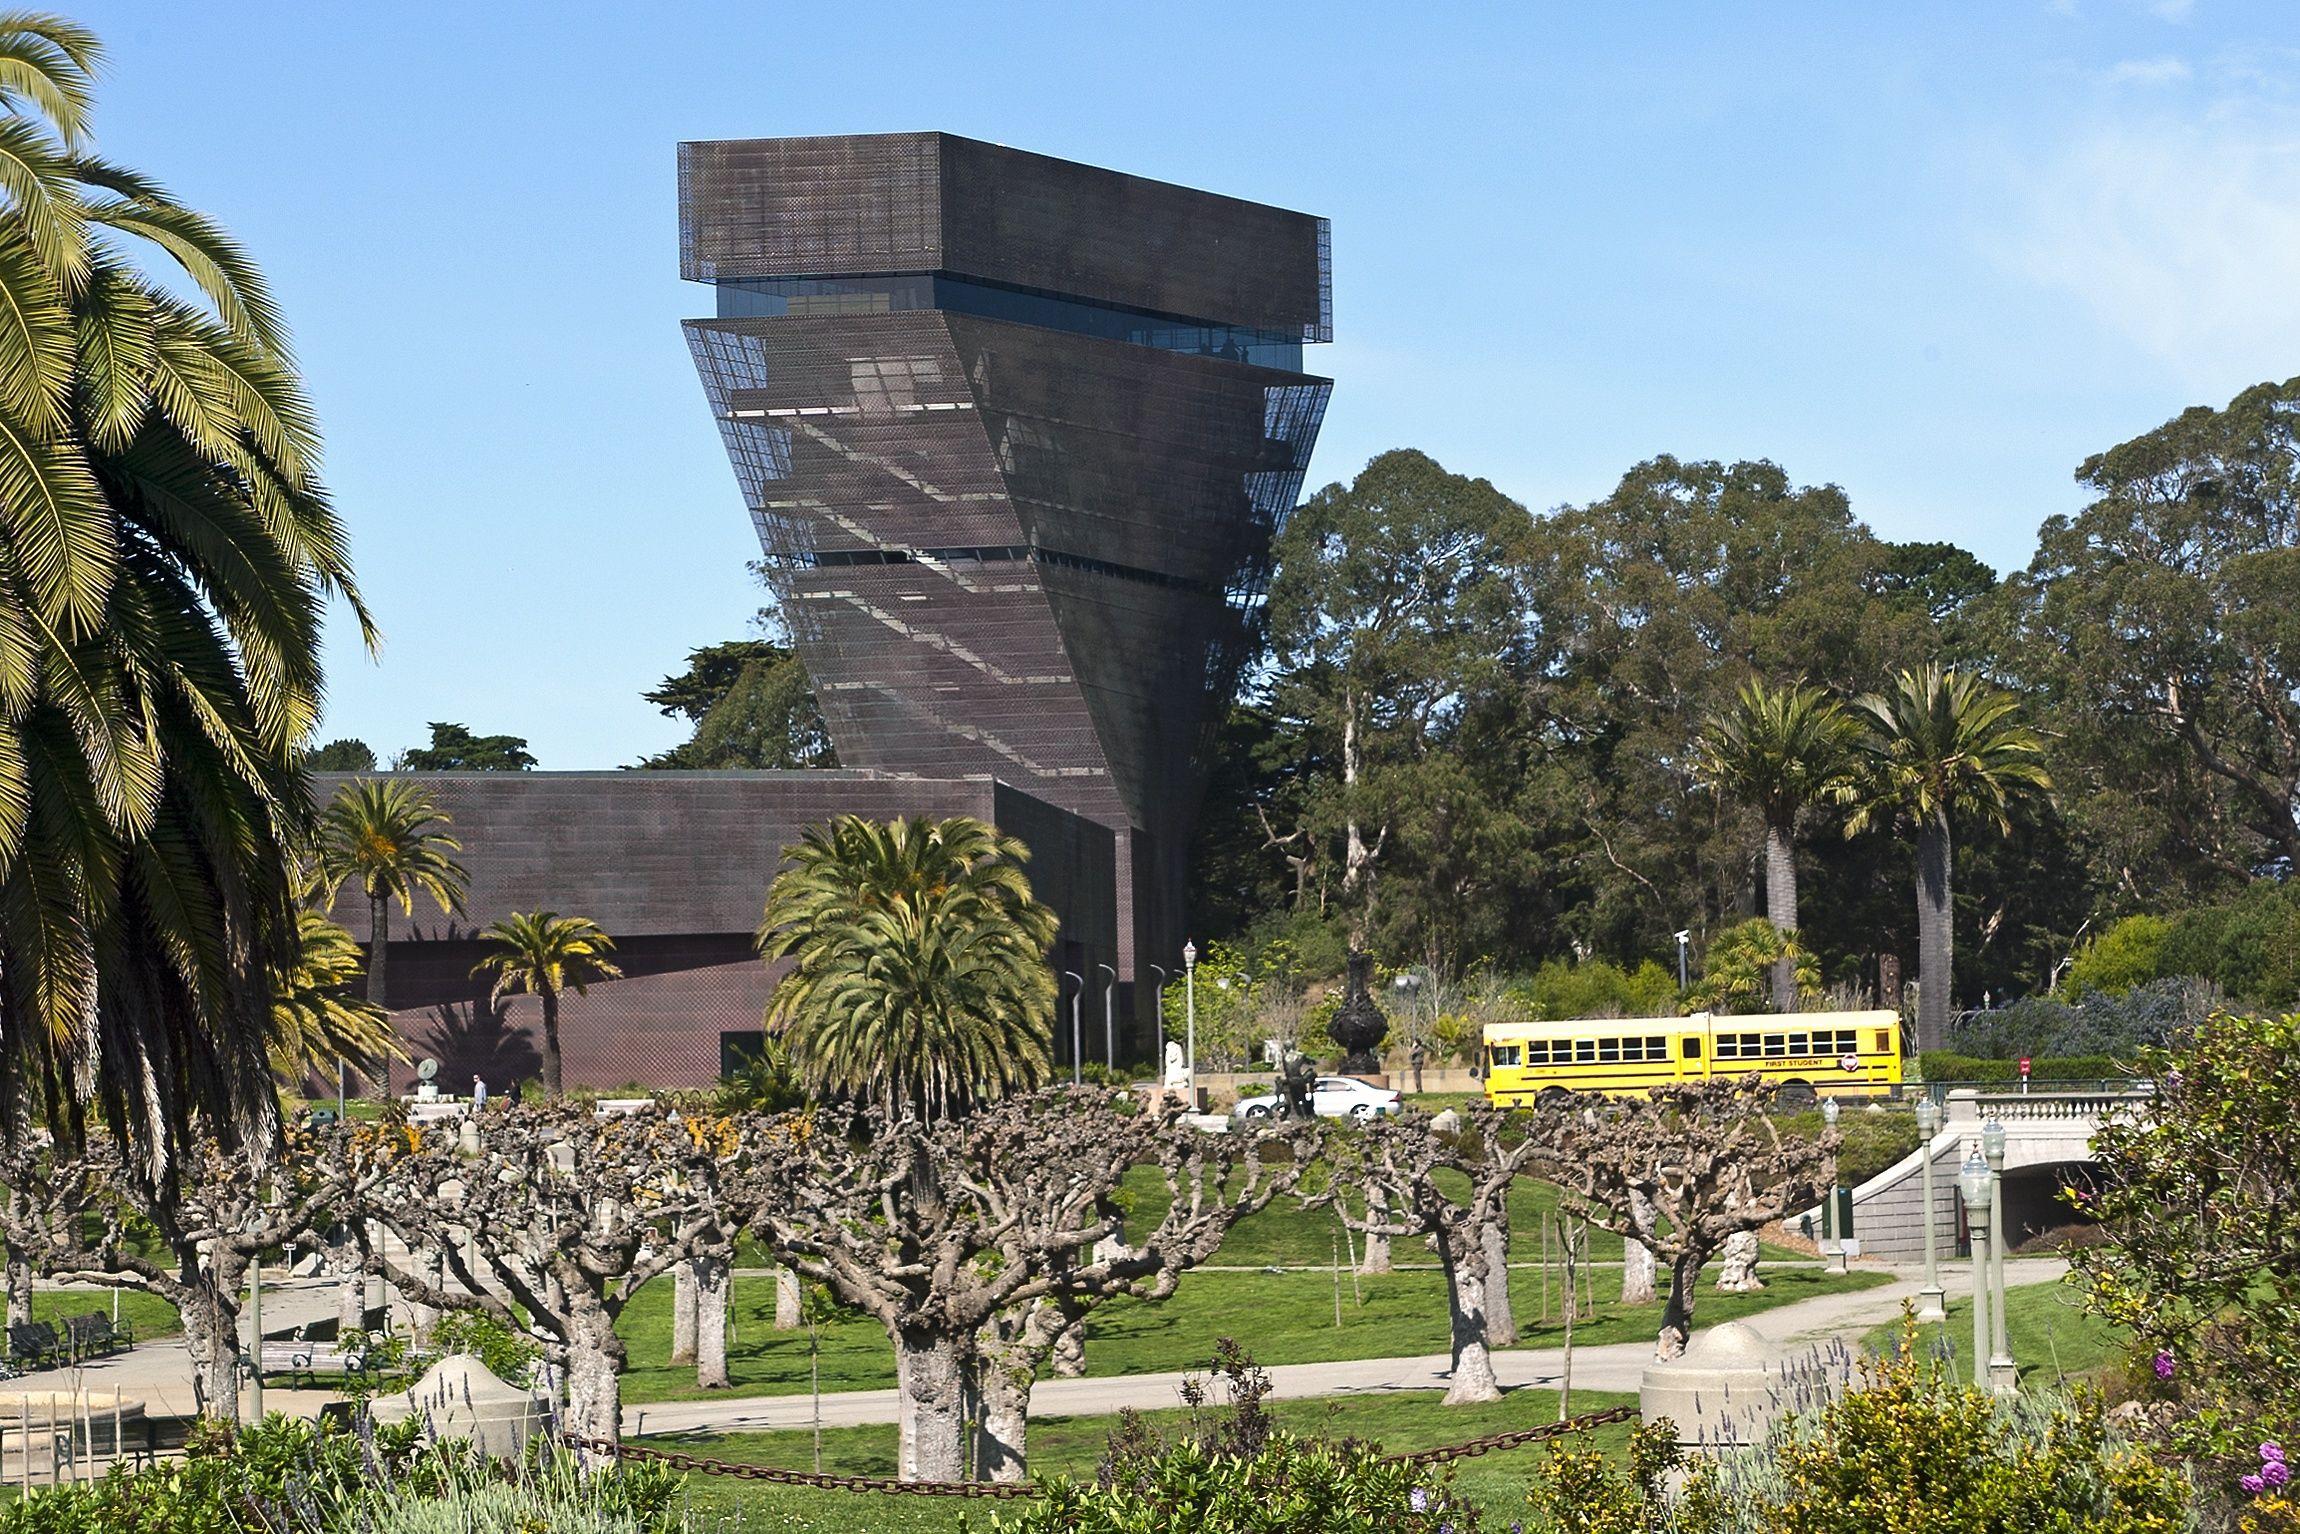 de Young Museum in Golden Gate Park is sandwiched between